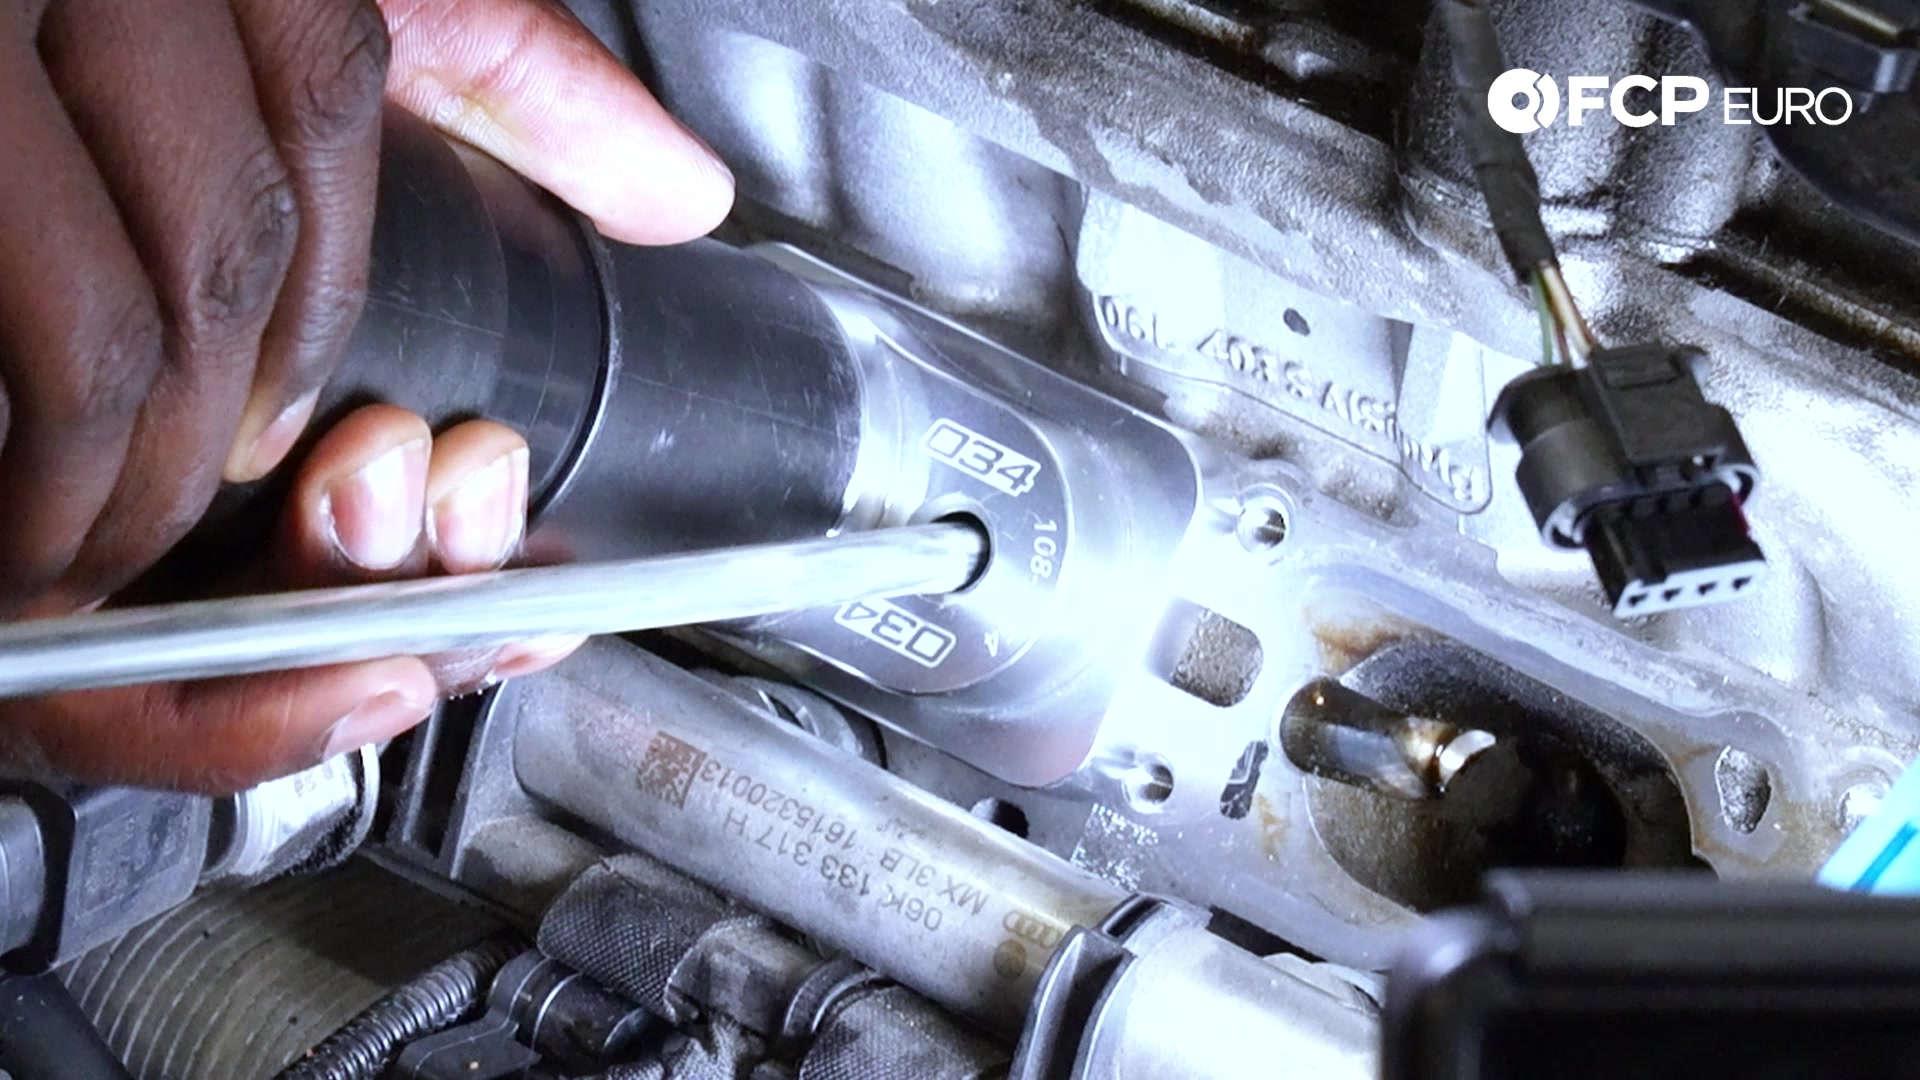 18-vw-mk7-gti-blasting-nozzle